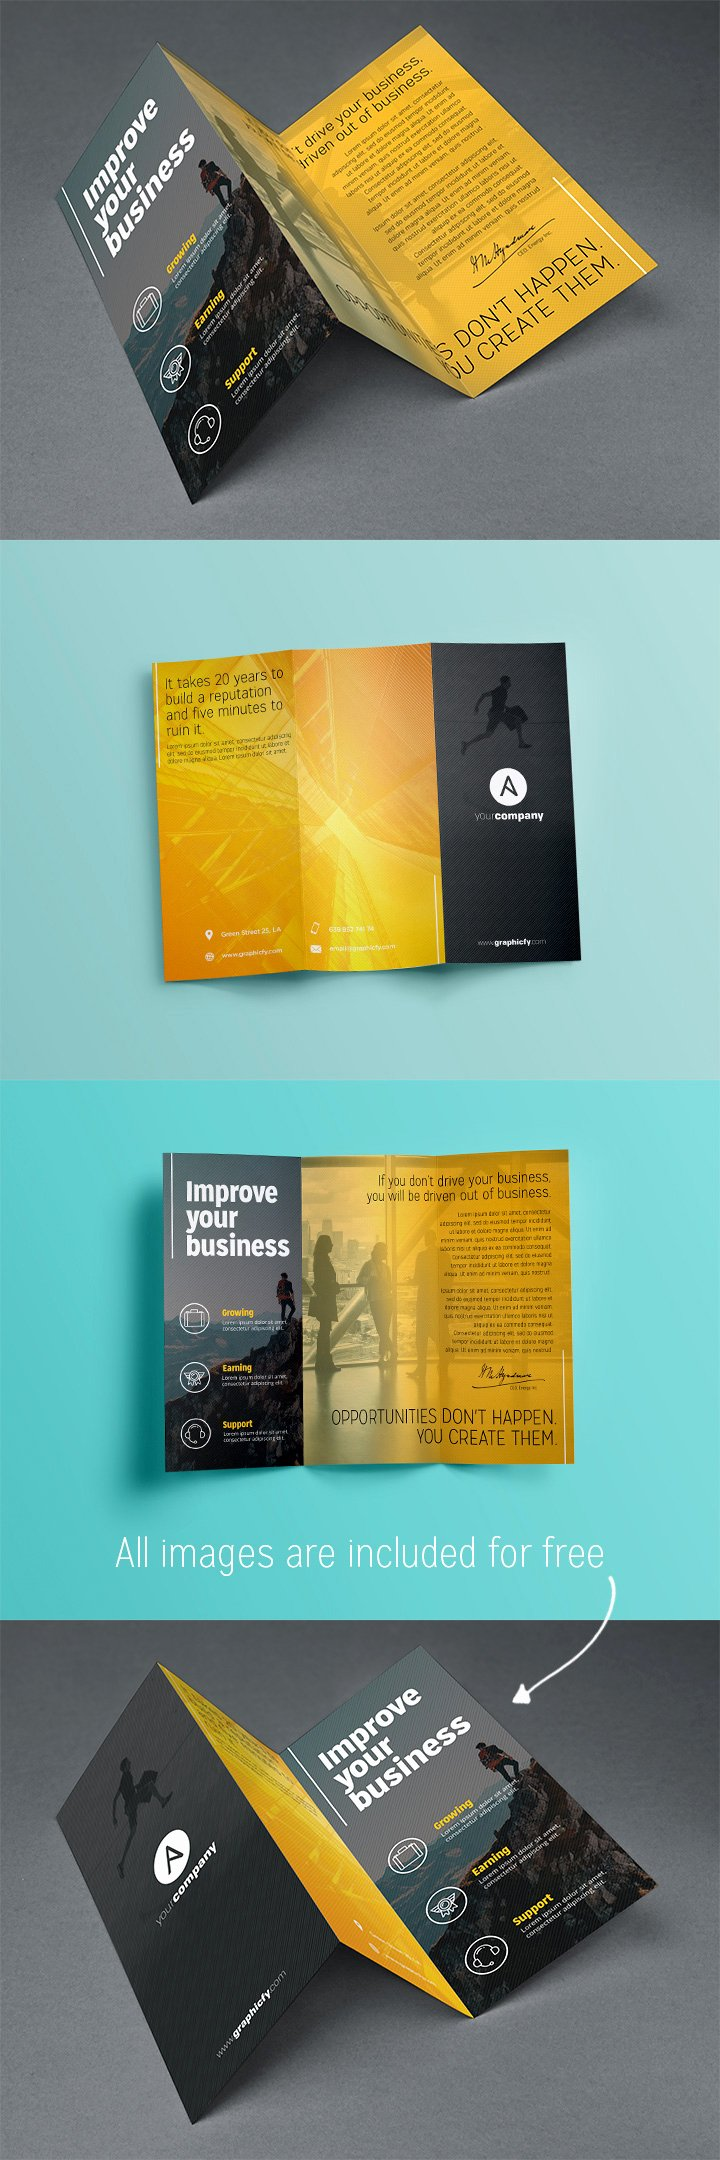 2 Fold Brochure Template Inspirational Tri Fold Brochure Template Psd Brochure Templates